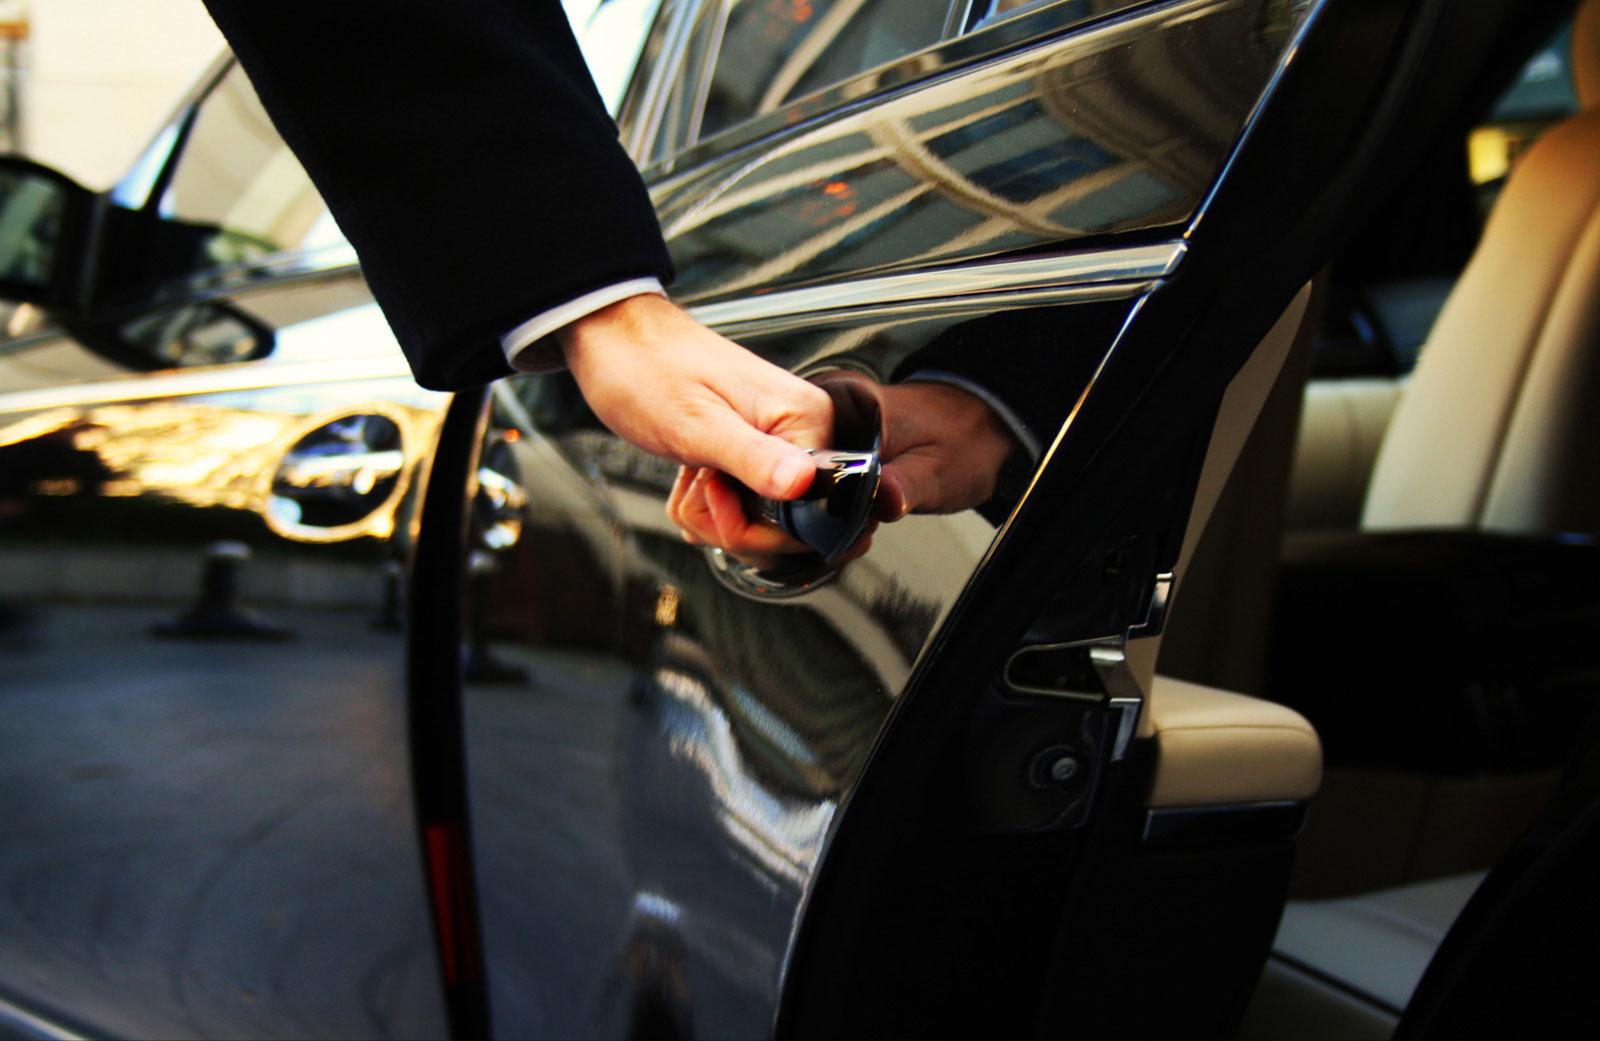 Airport-Transfer-Service.jpg